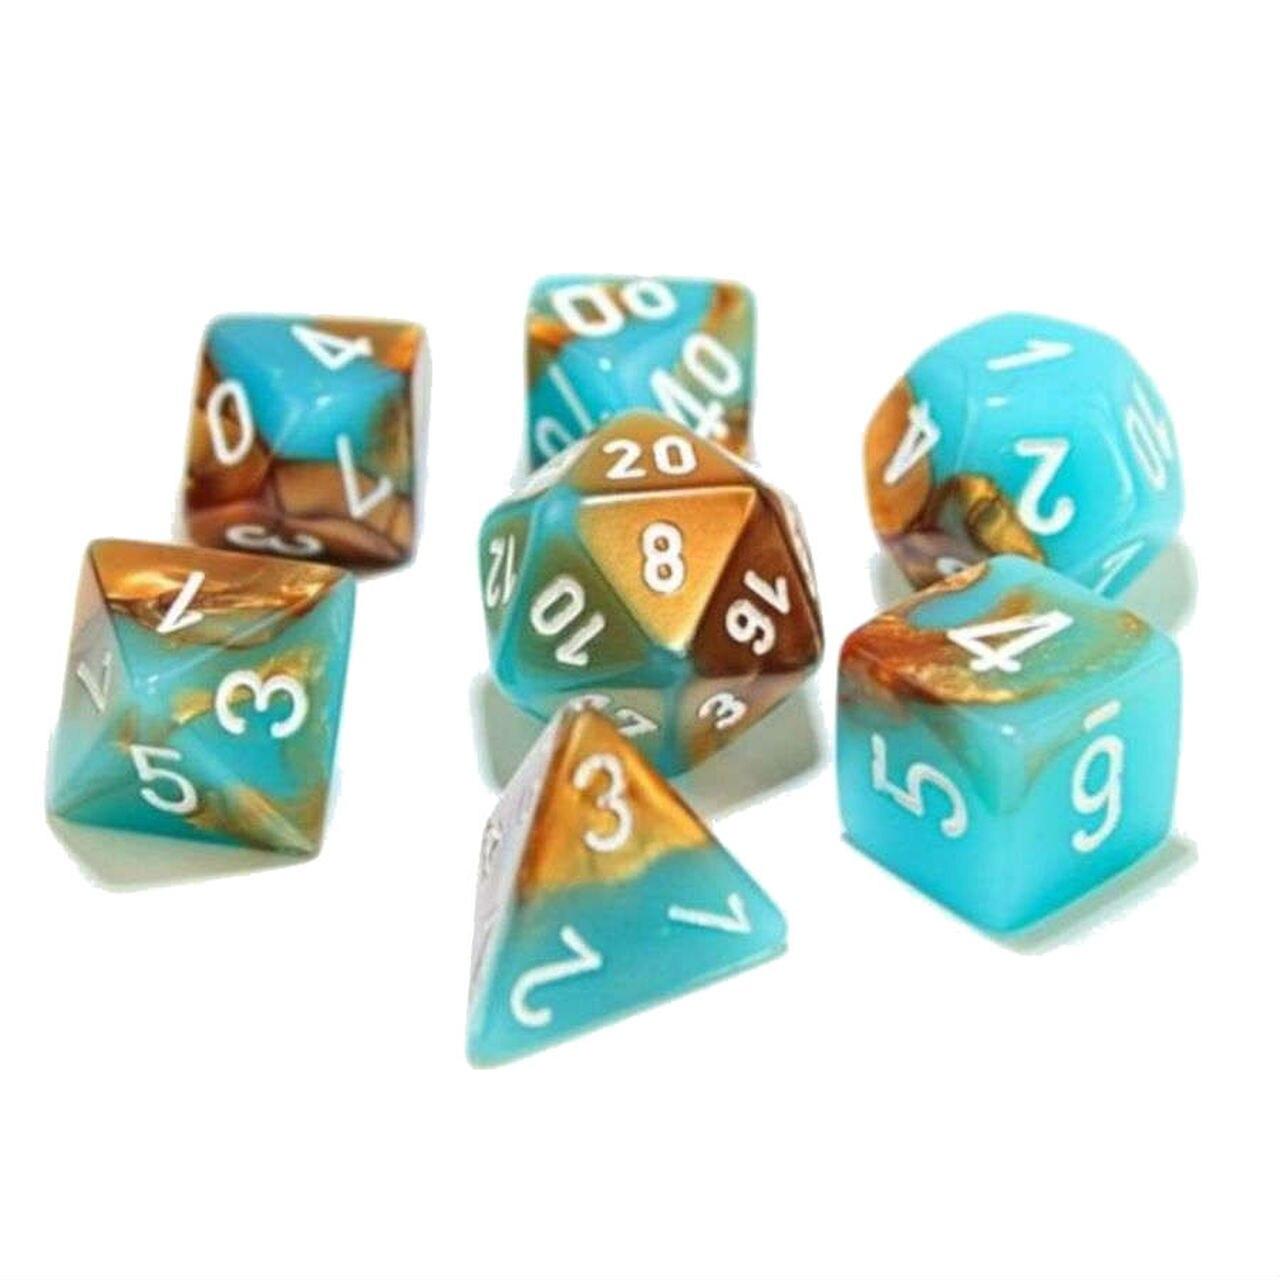 7-Die Set: Gemini Copper-Turquoise/White with Luminary - CHX30019